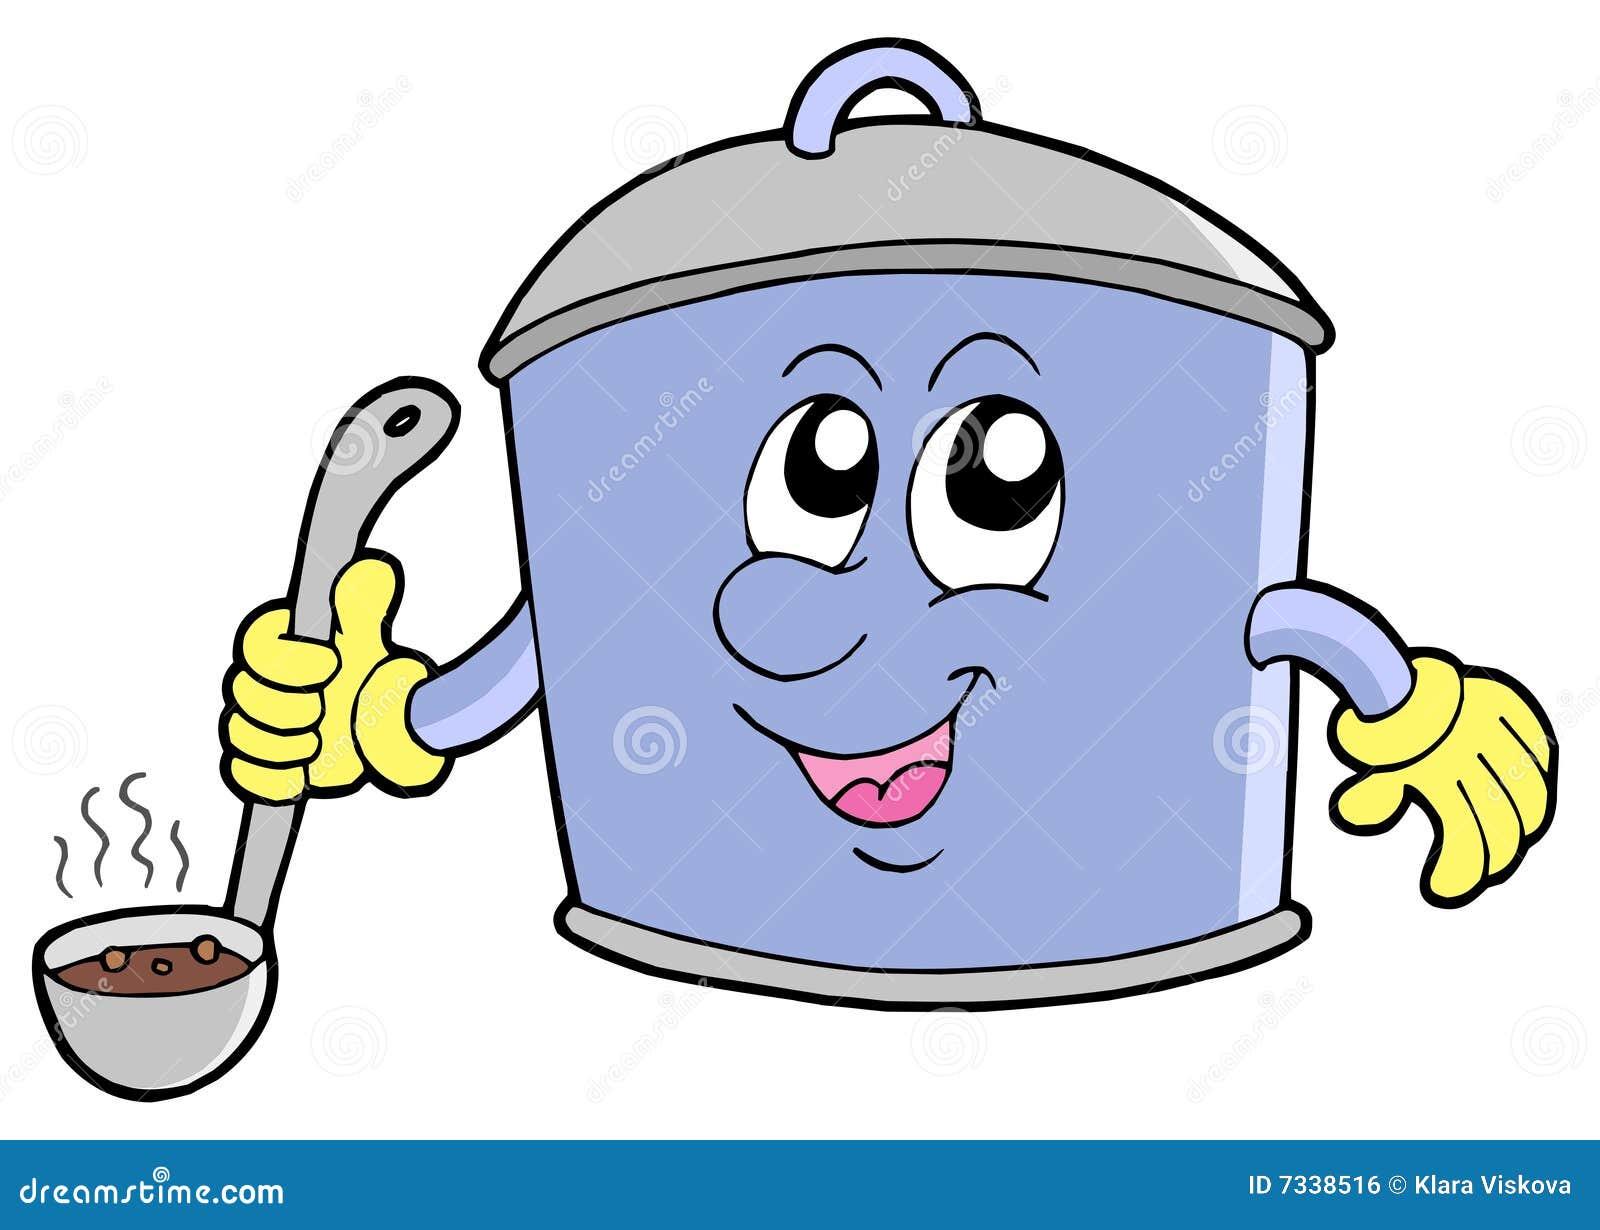 Soup Kitchen Cartoon